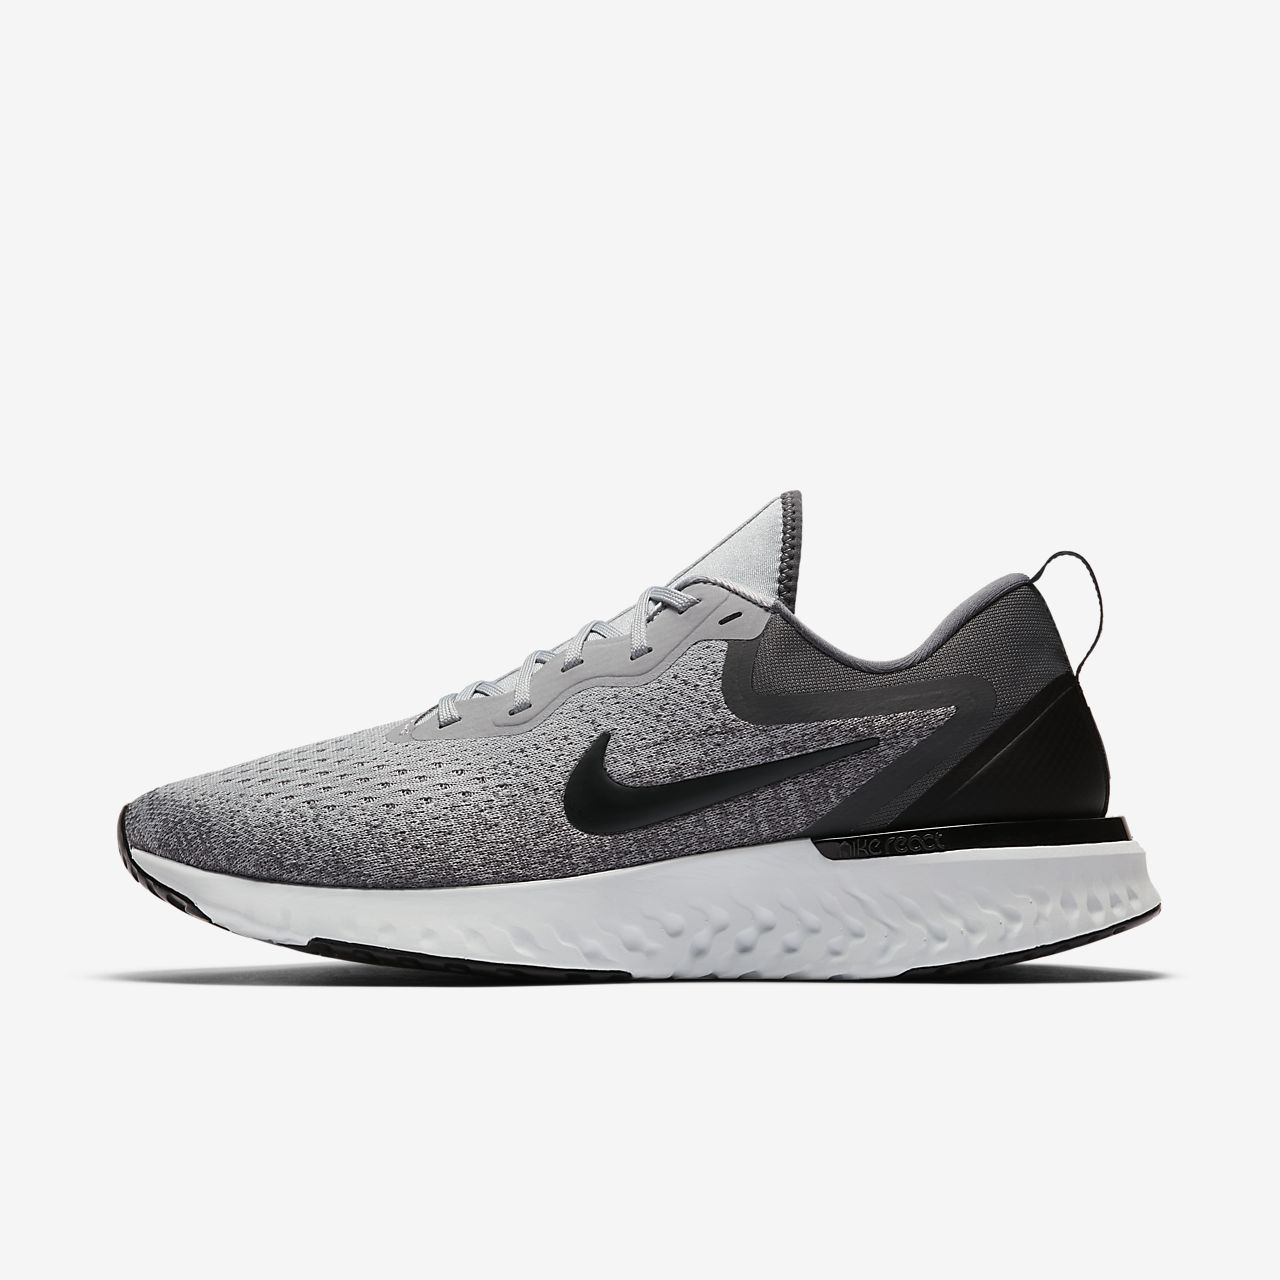 new product 42806 84833 Nike Odyssey React Men's Running Shoe. Nike.com GB